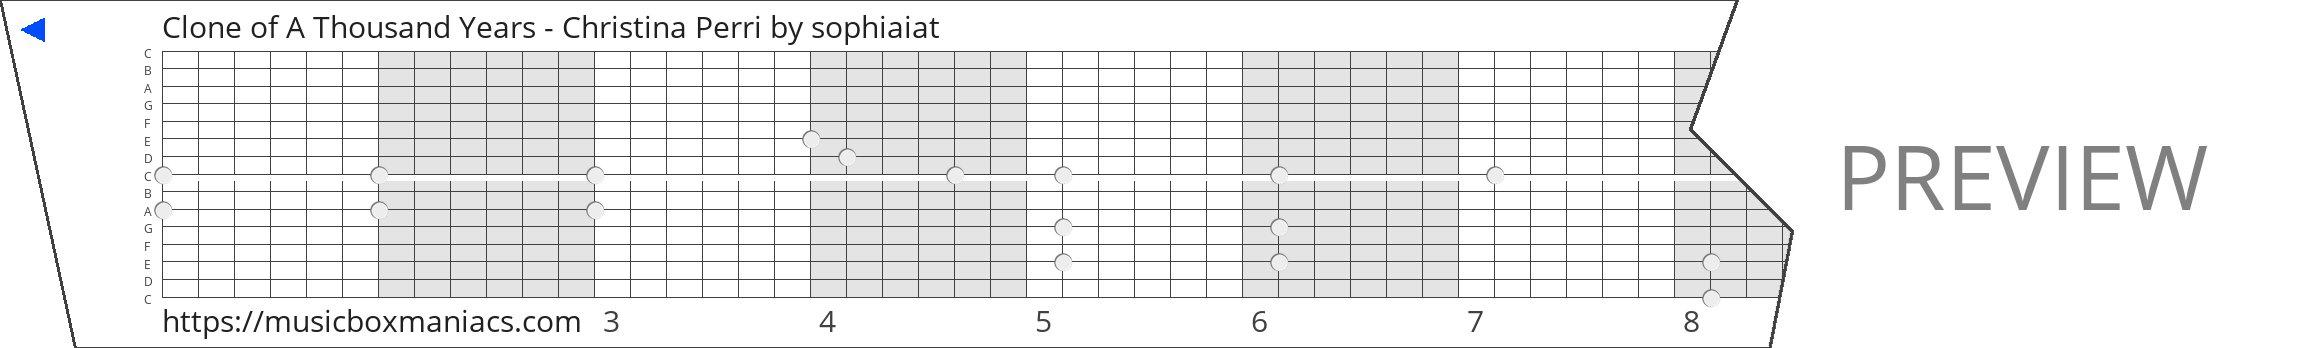 Clone of A Thousand Years - Christina Perri 15 note music box paper strip